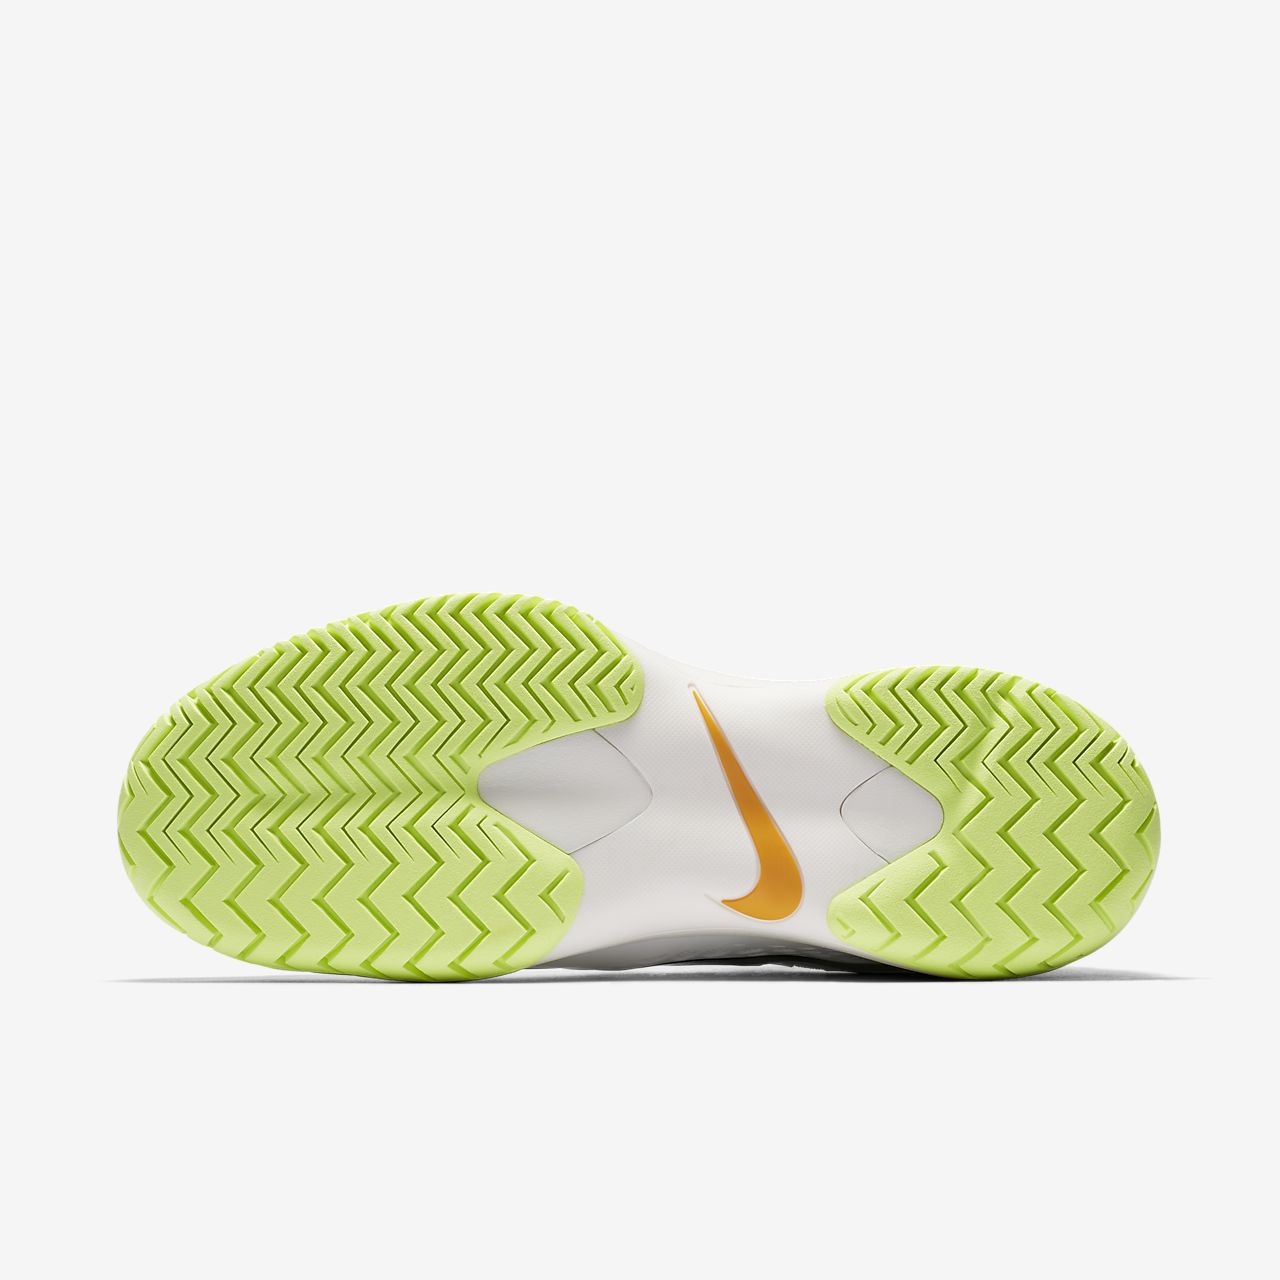 scarpa da tennis nike zoom cage 3 hc biancoblackened blue